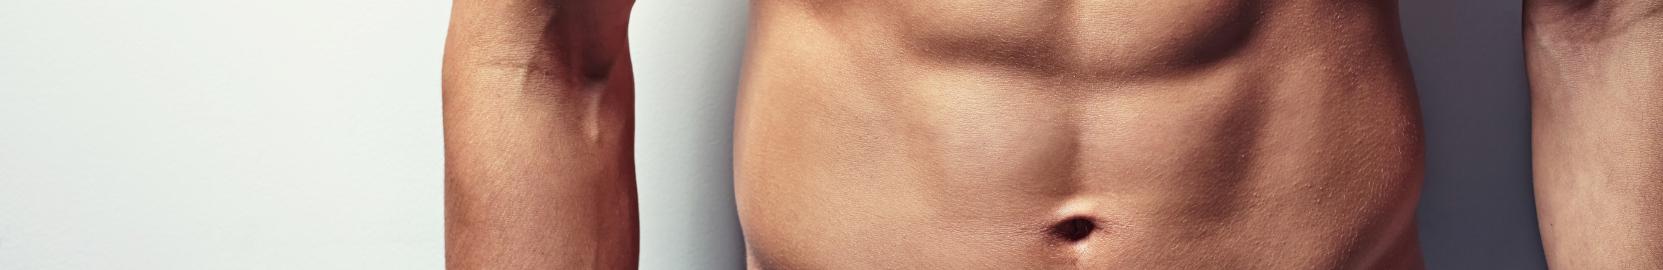 Slider para hombres abdomen